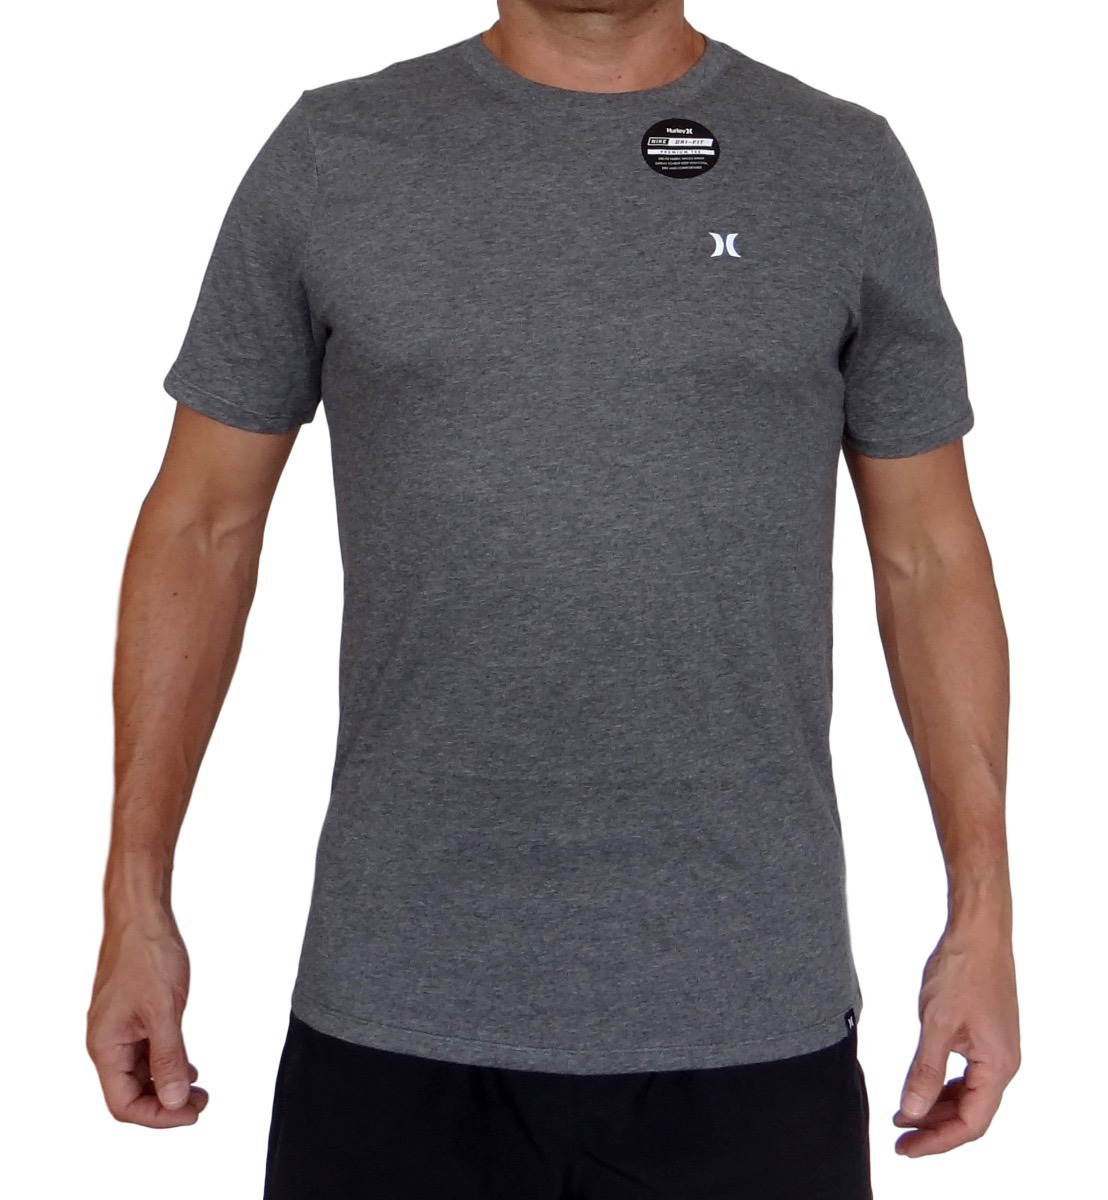 dbfa82a1040d4 Camiseta Hurley Icon Drifit Prem Shor In -   114.900 en Mercado Libre